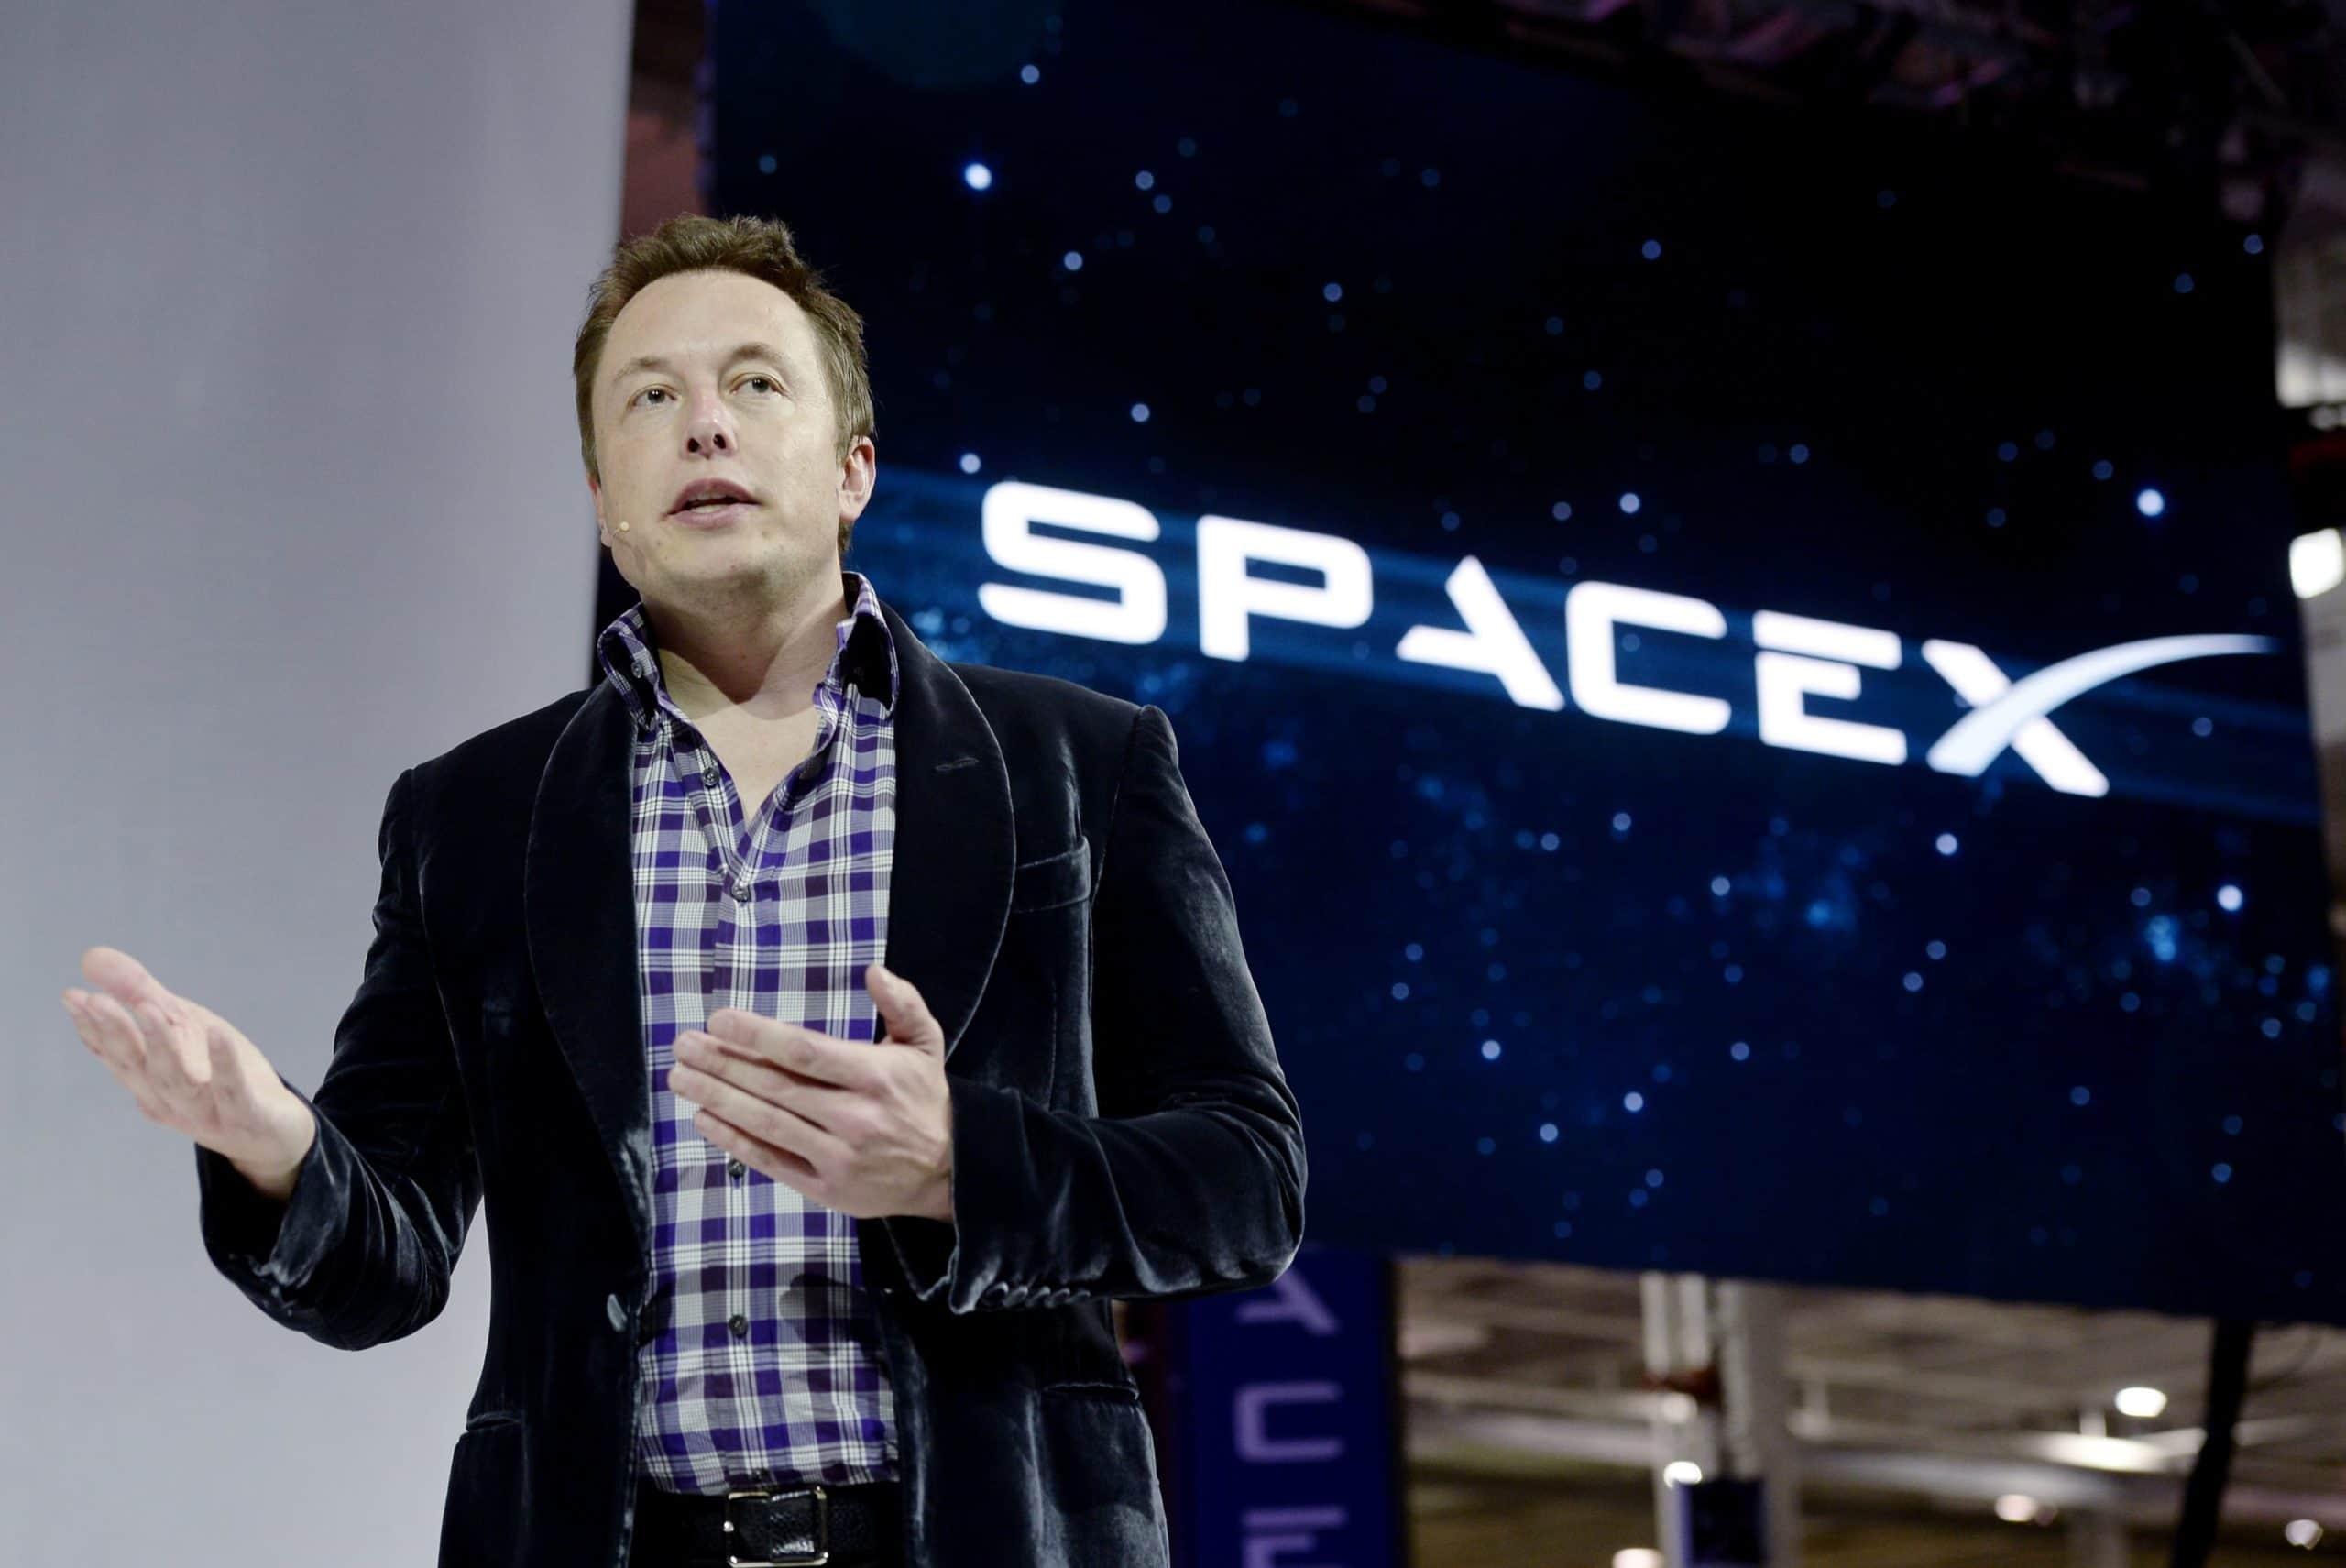 Breaking News: SpaceX CEO Elon Musk to Speak Virtually at 2020 Mars Societ